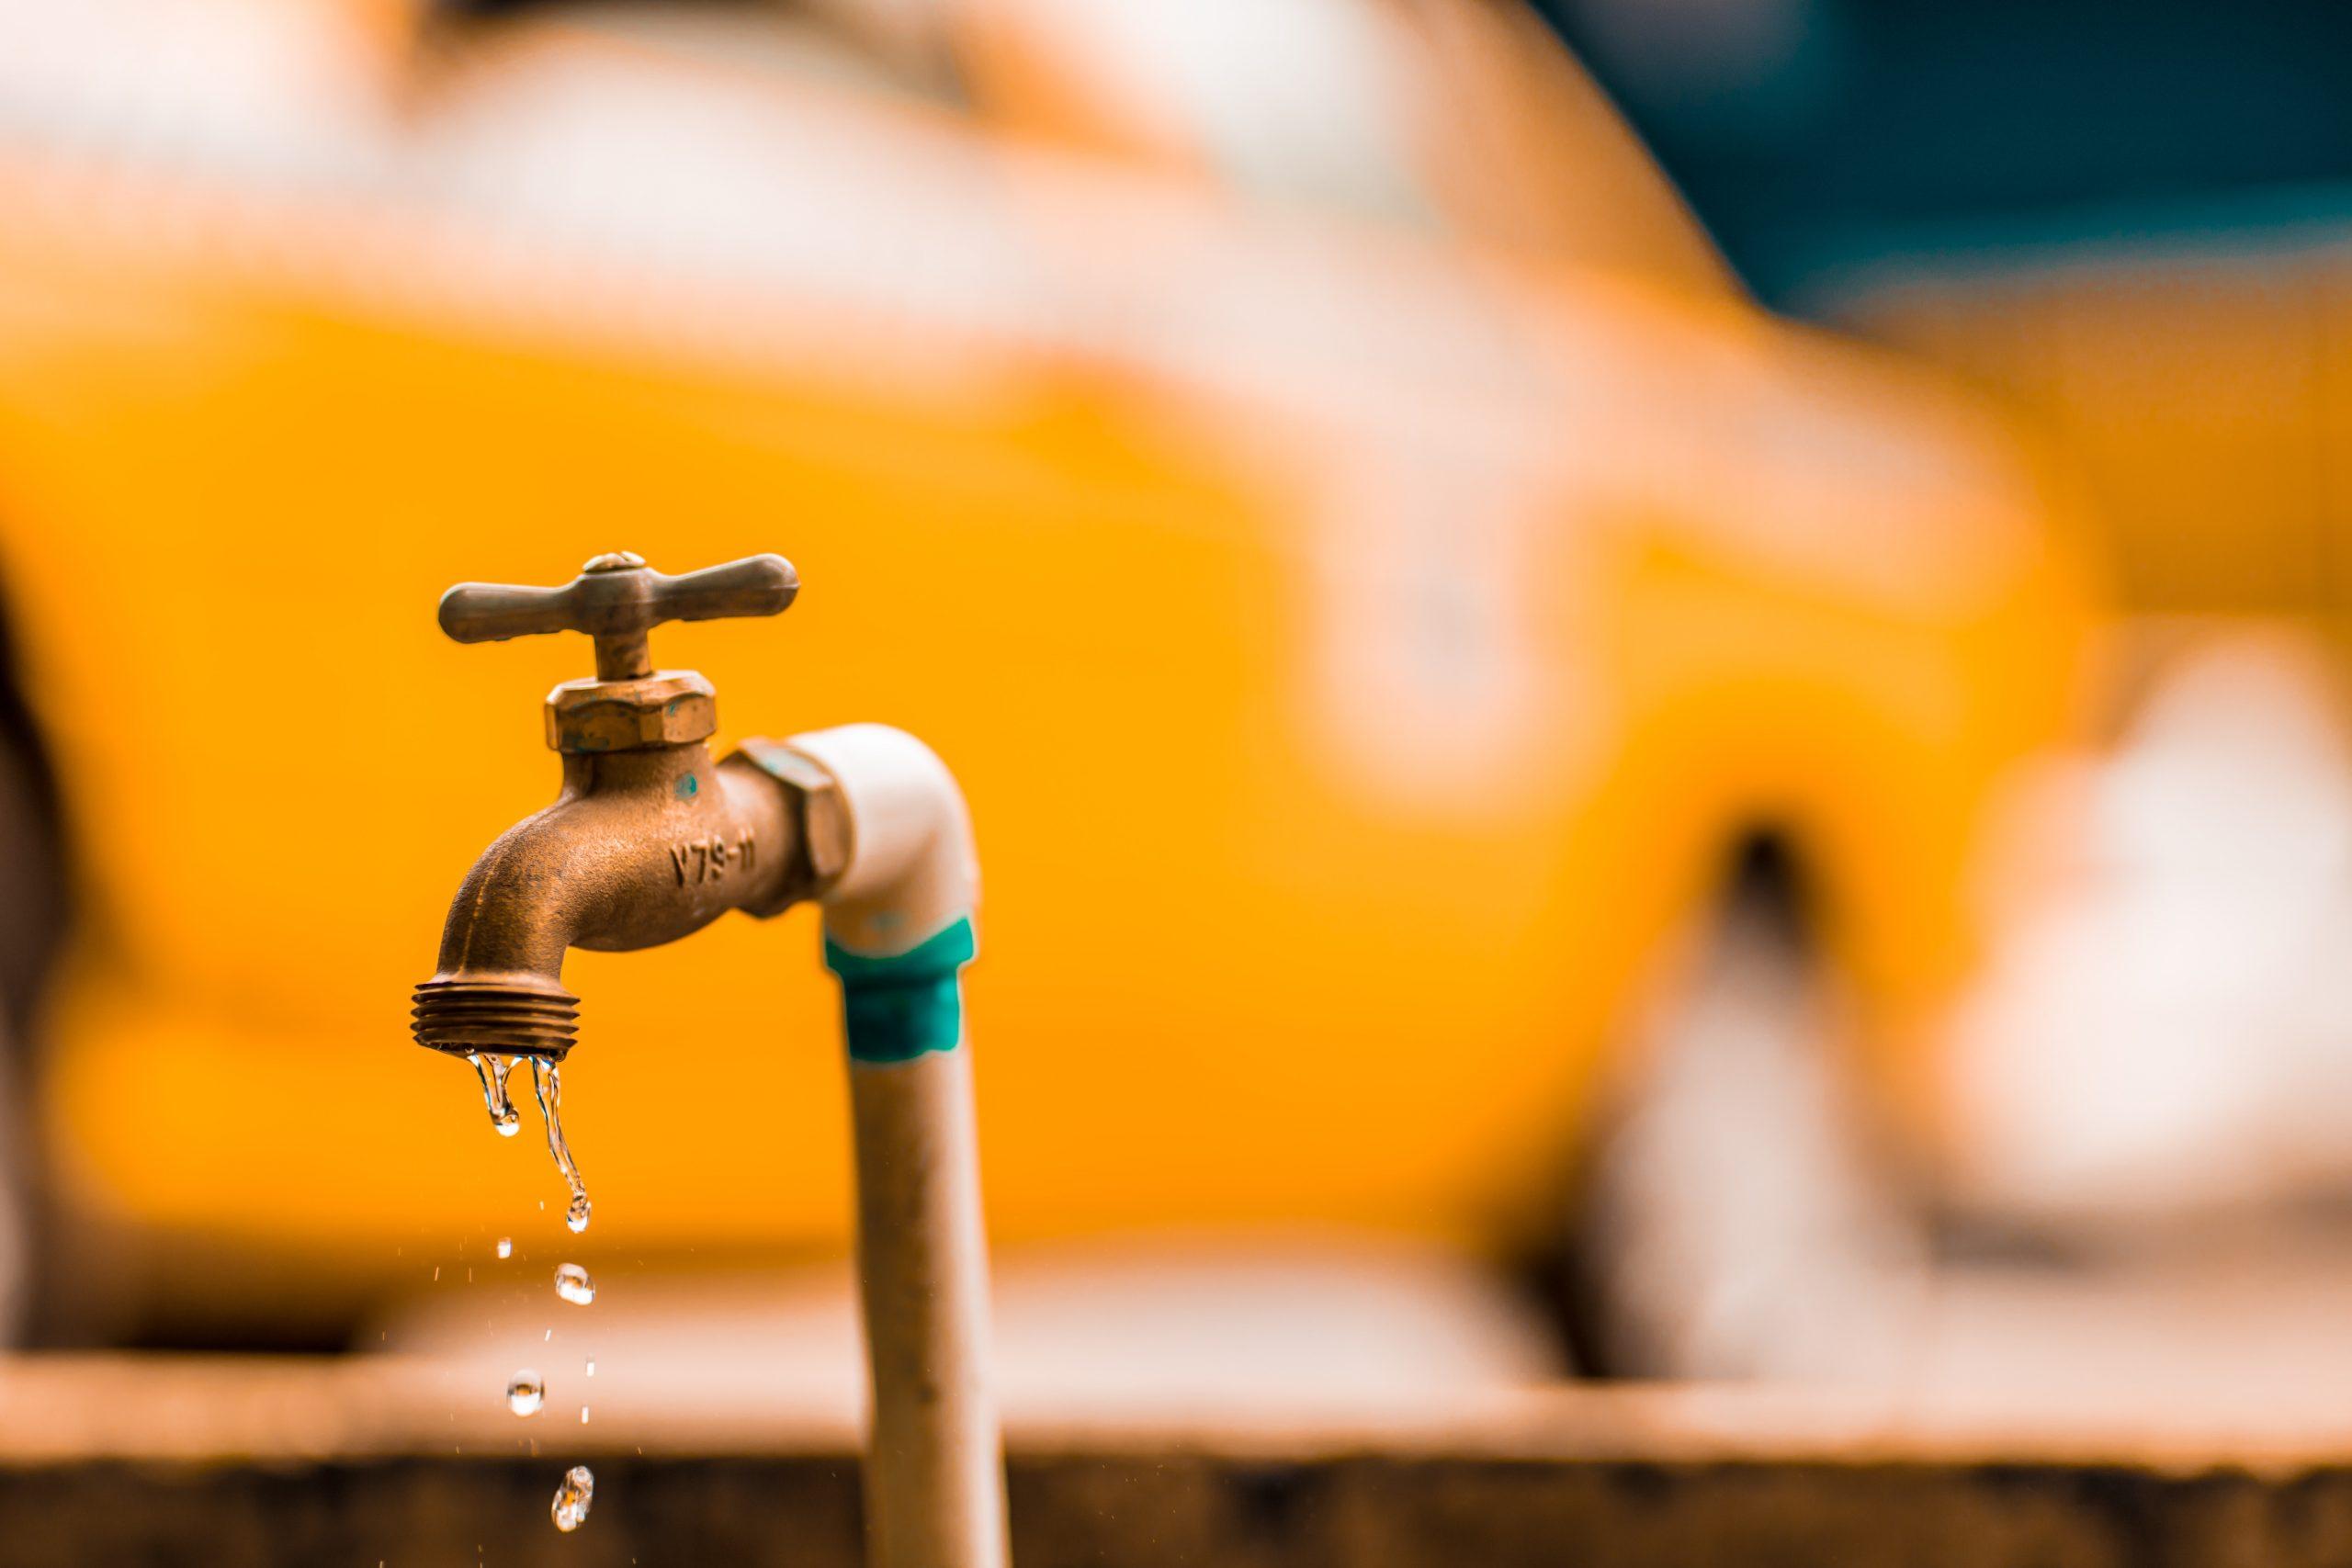 Hot Water Heater Leaking